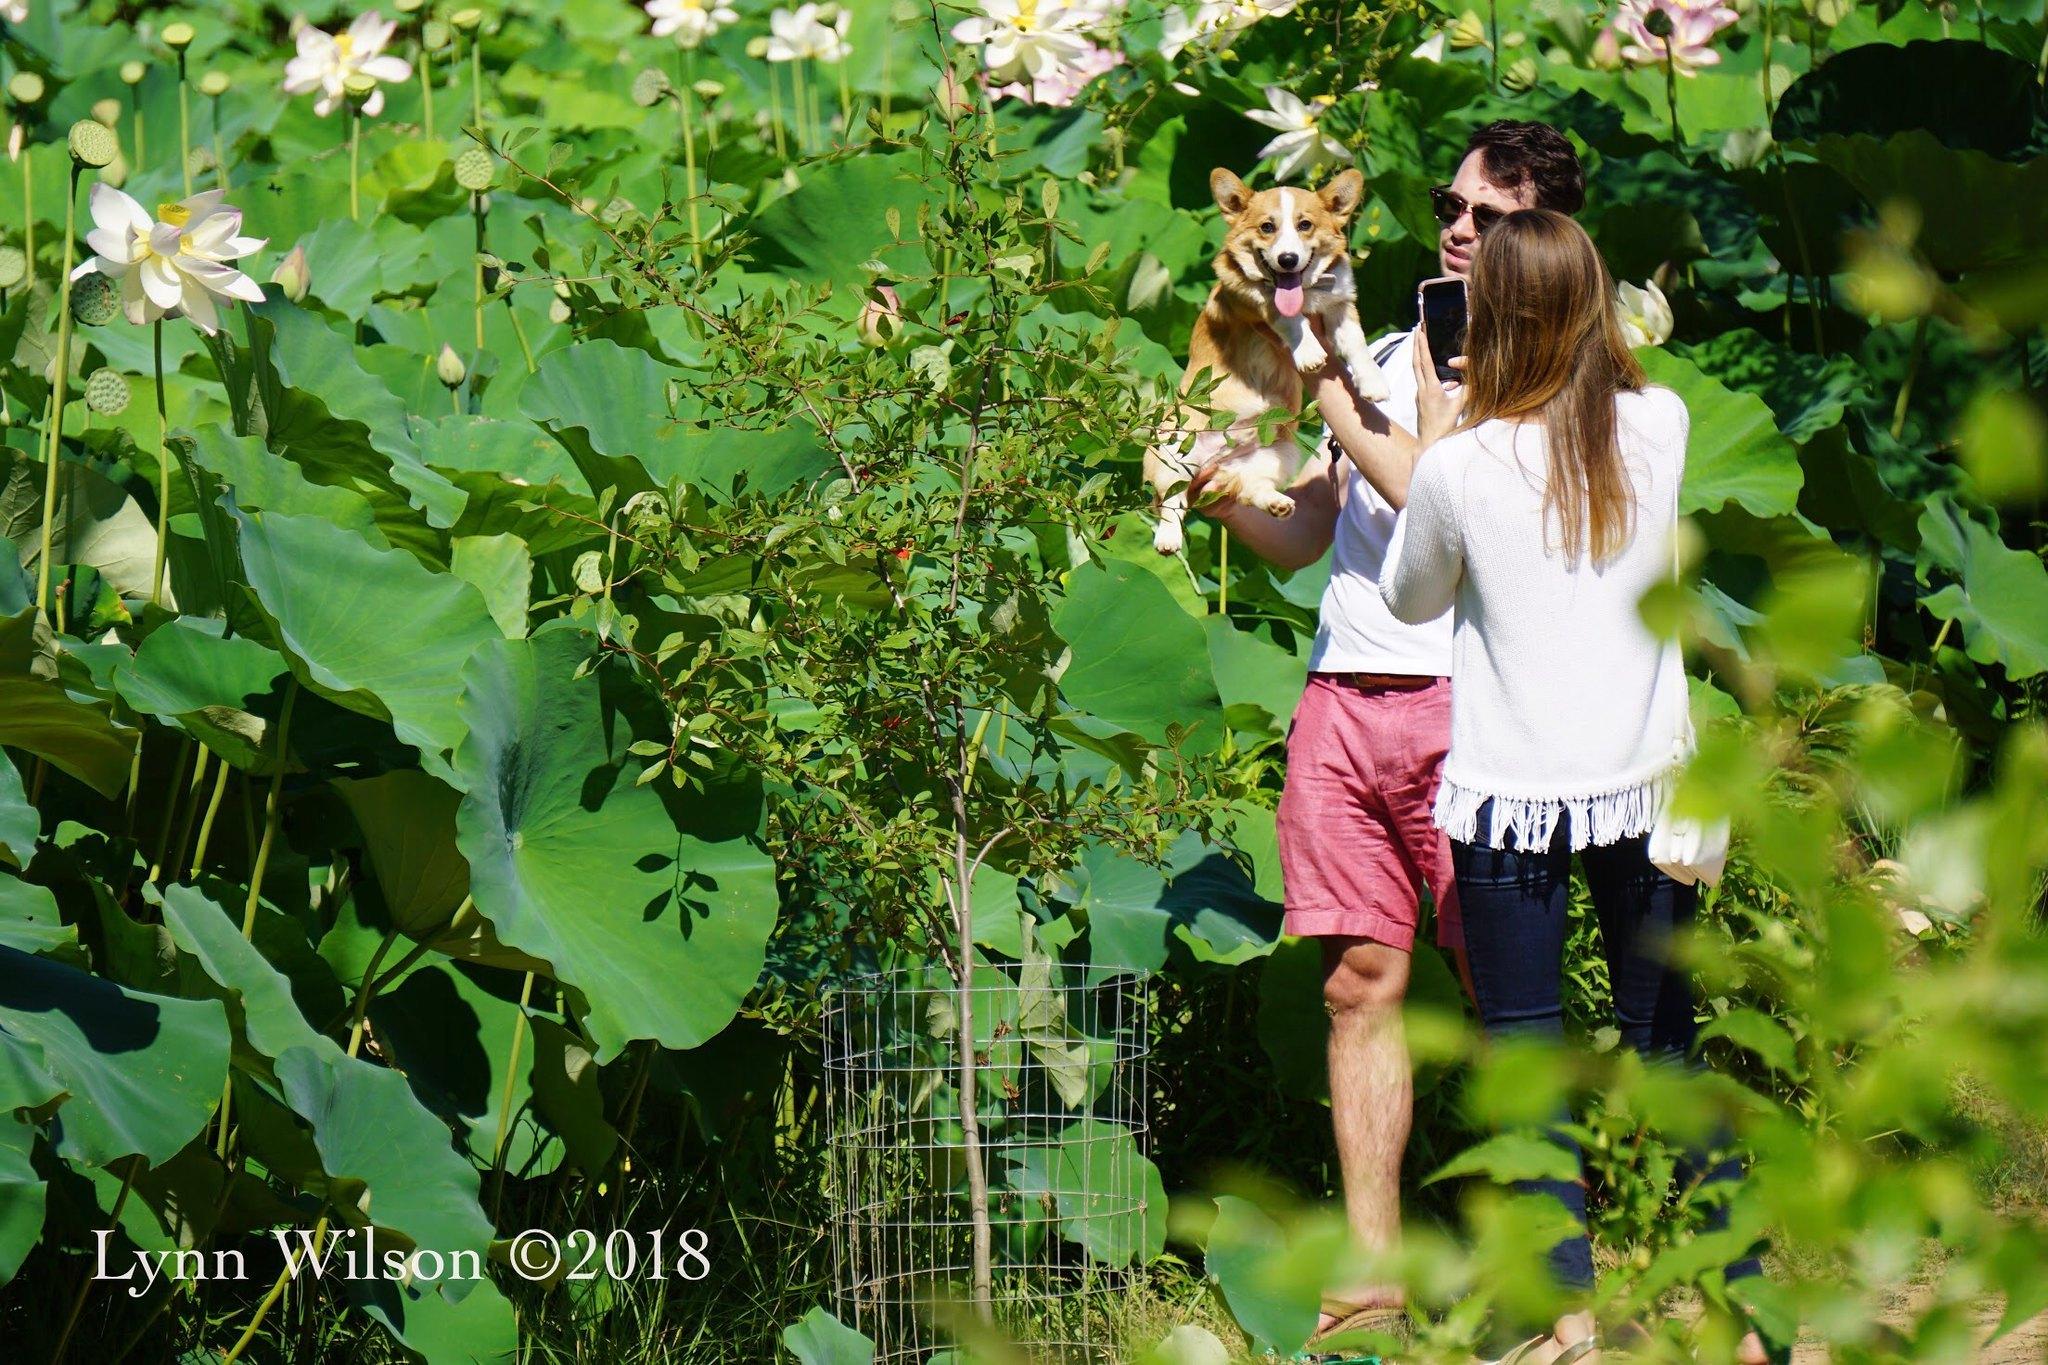 Corgi being photographed at Kenilworth Aquatic Gardens